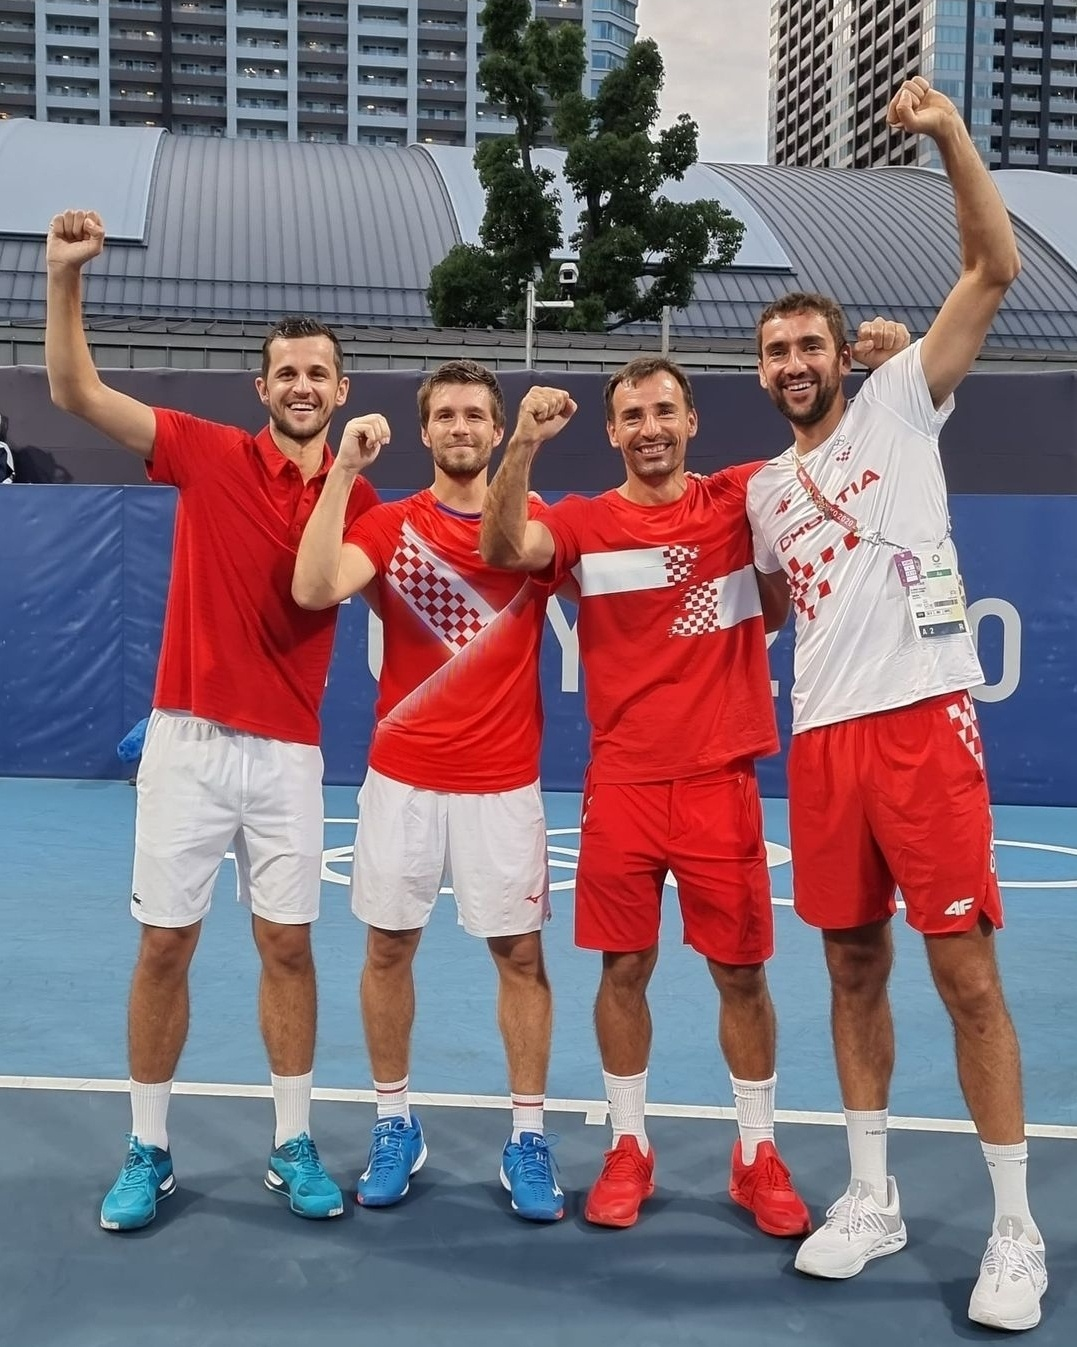 finalisti - Rusija kot edina v Tokiu do treh olimpijskih odličij v tenisu